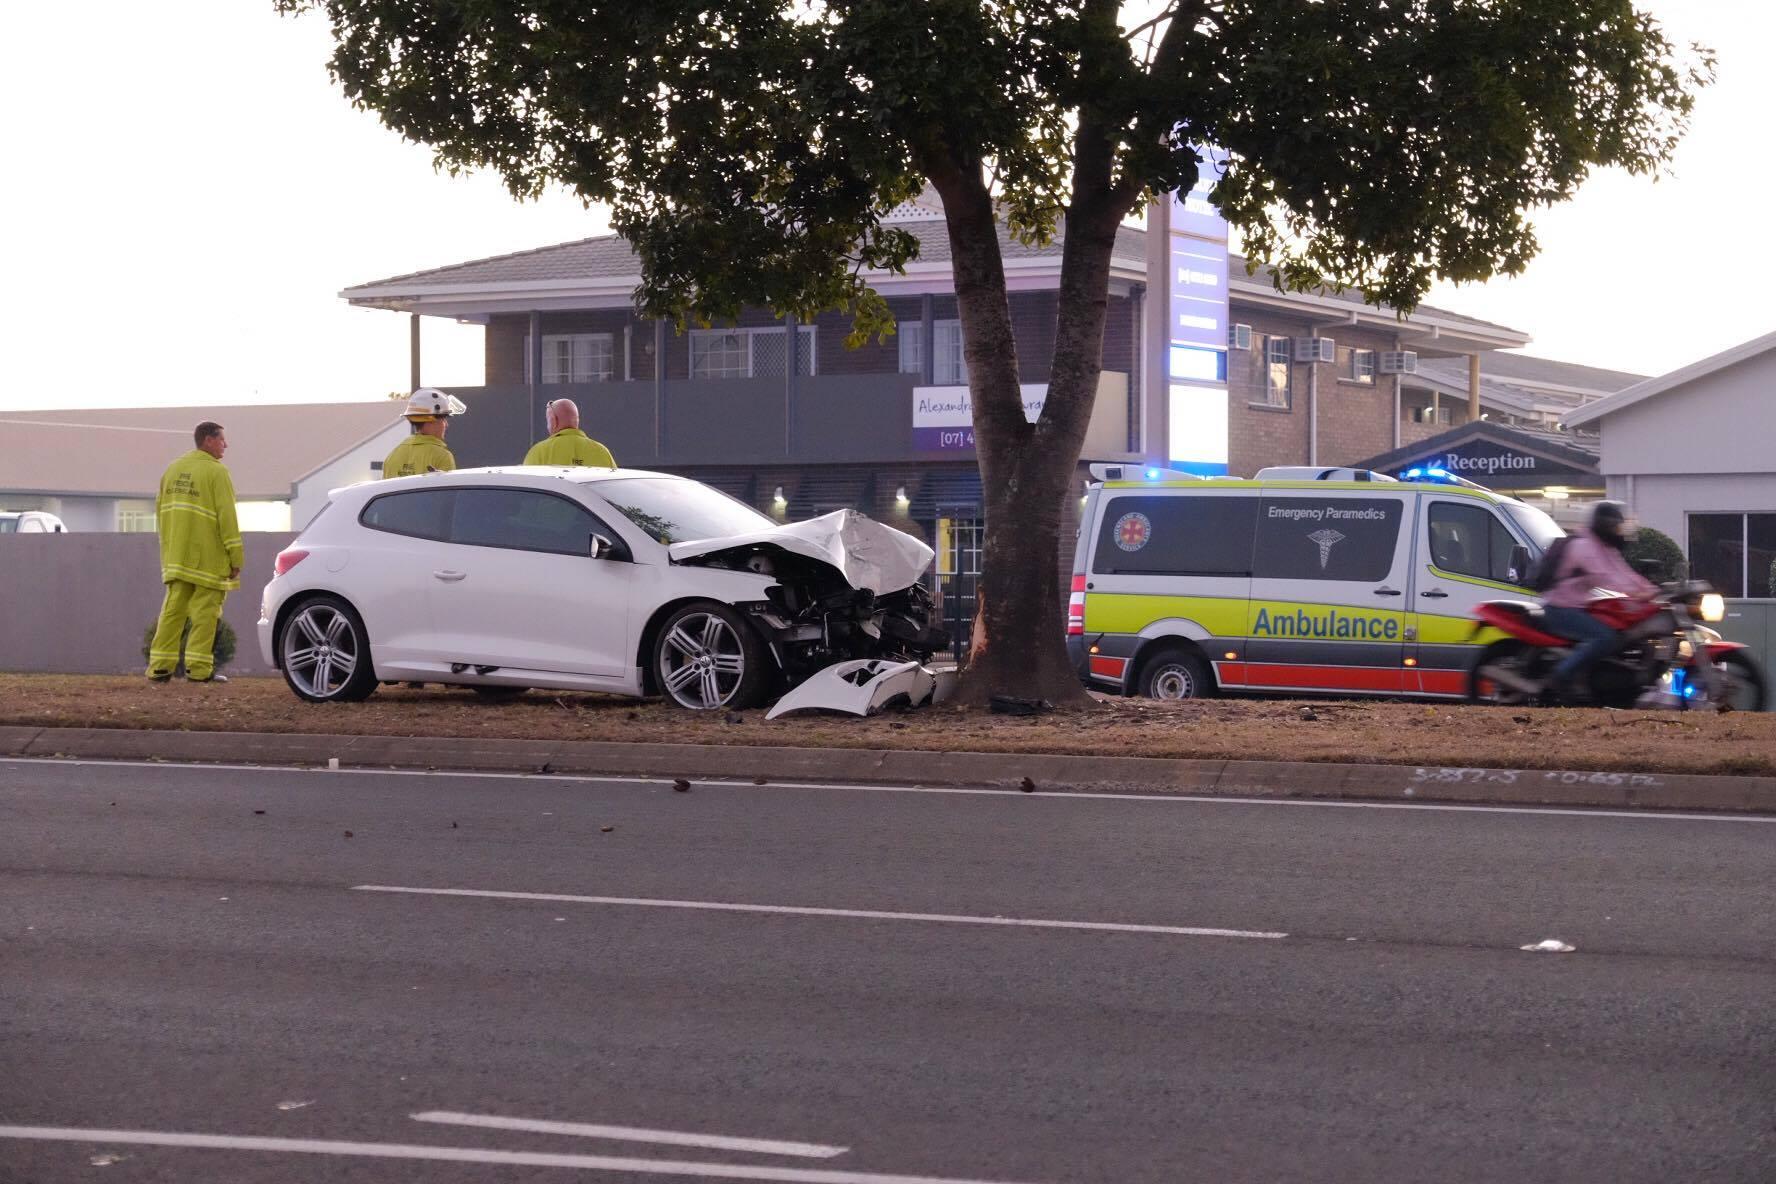 The scene of the crash on Takalvan St.